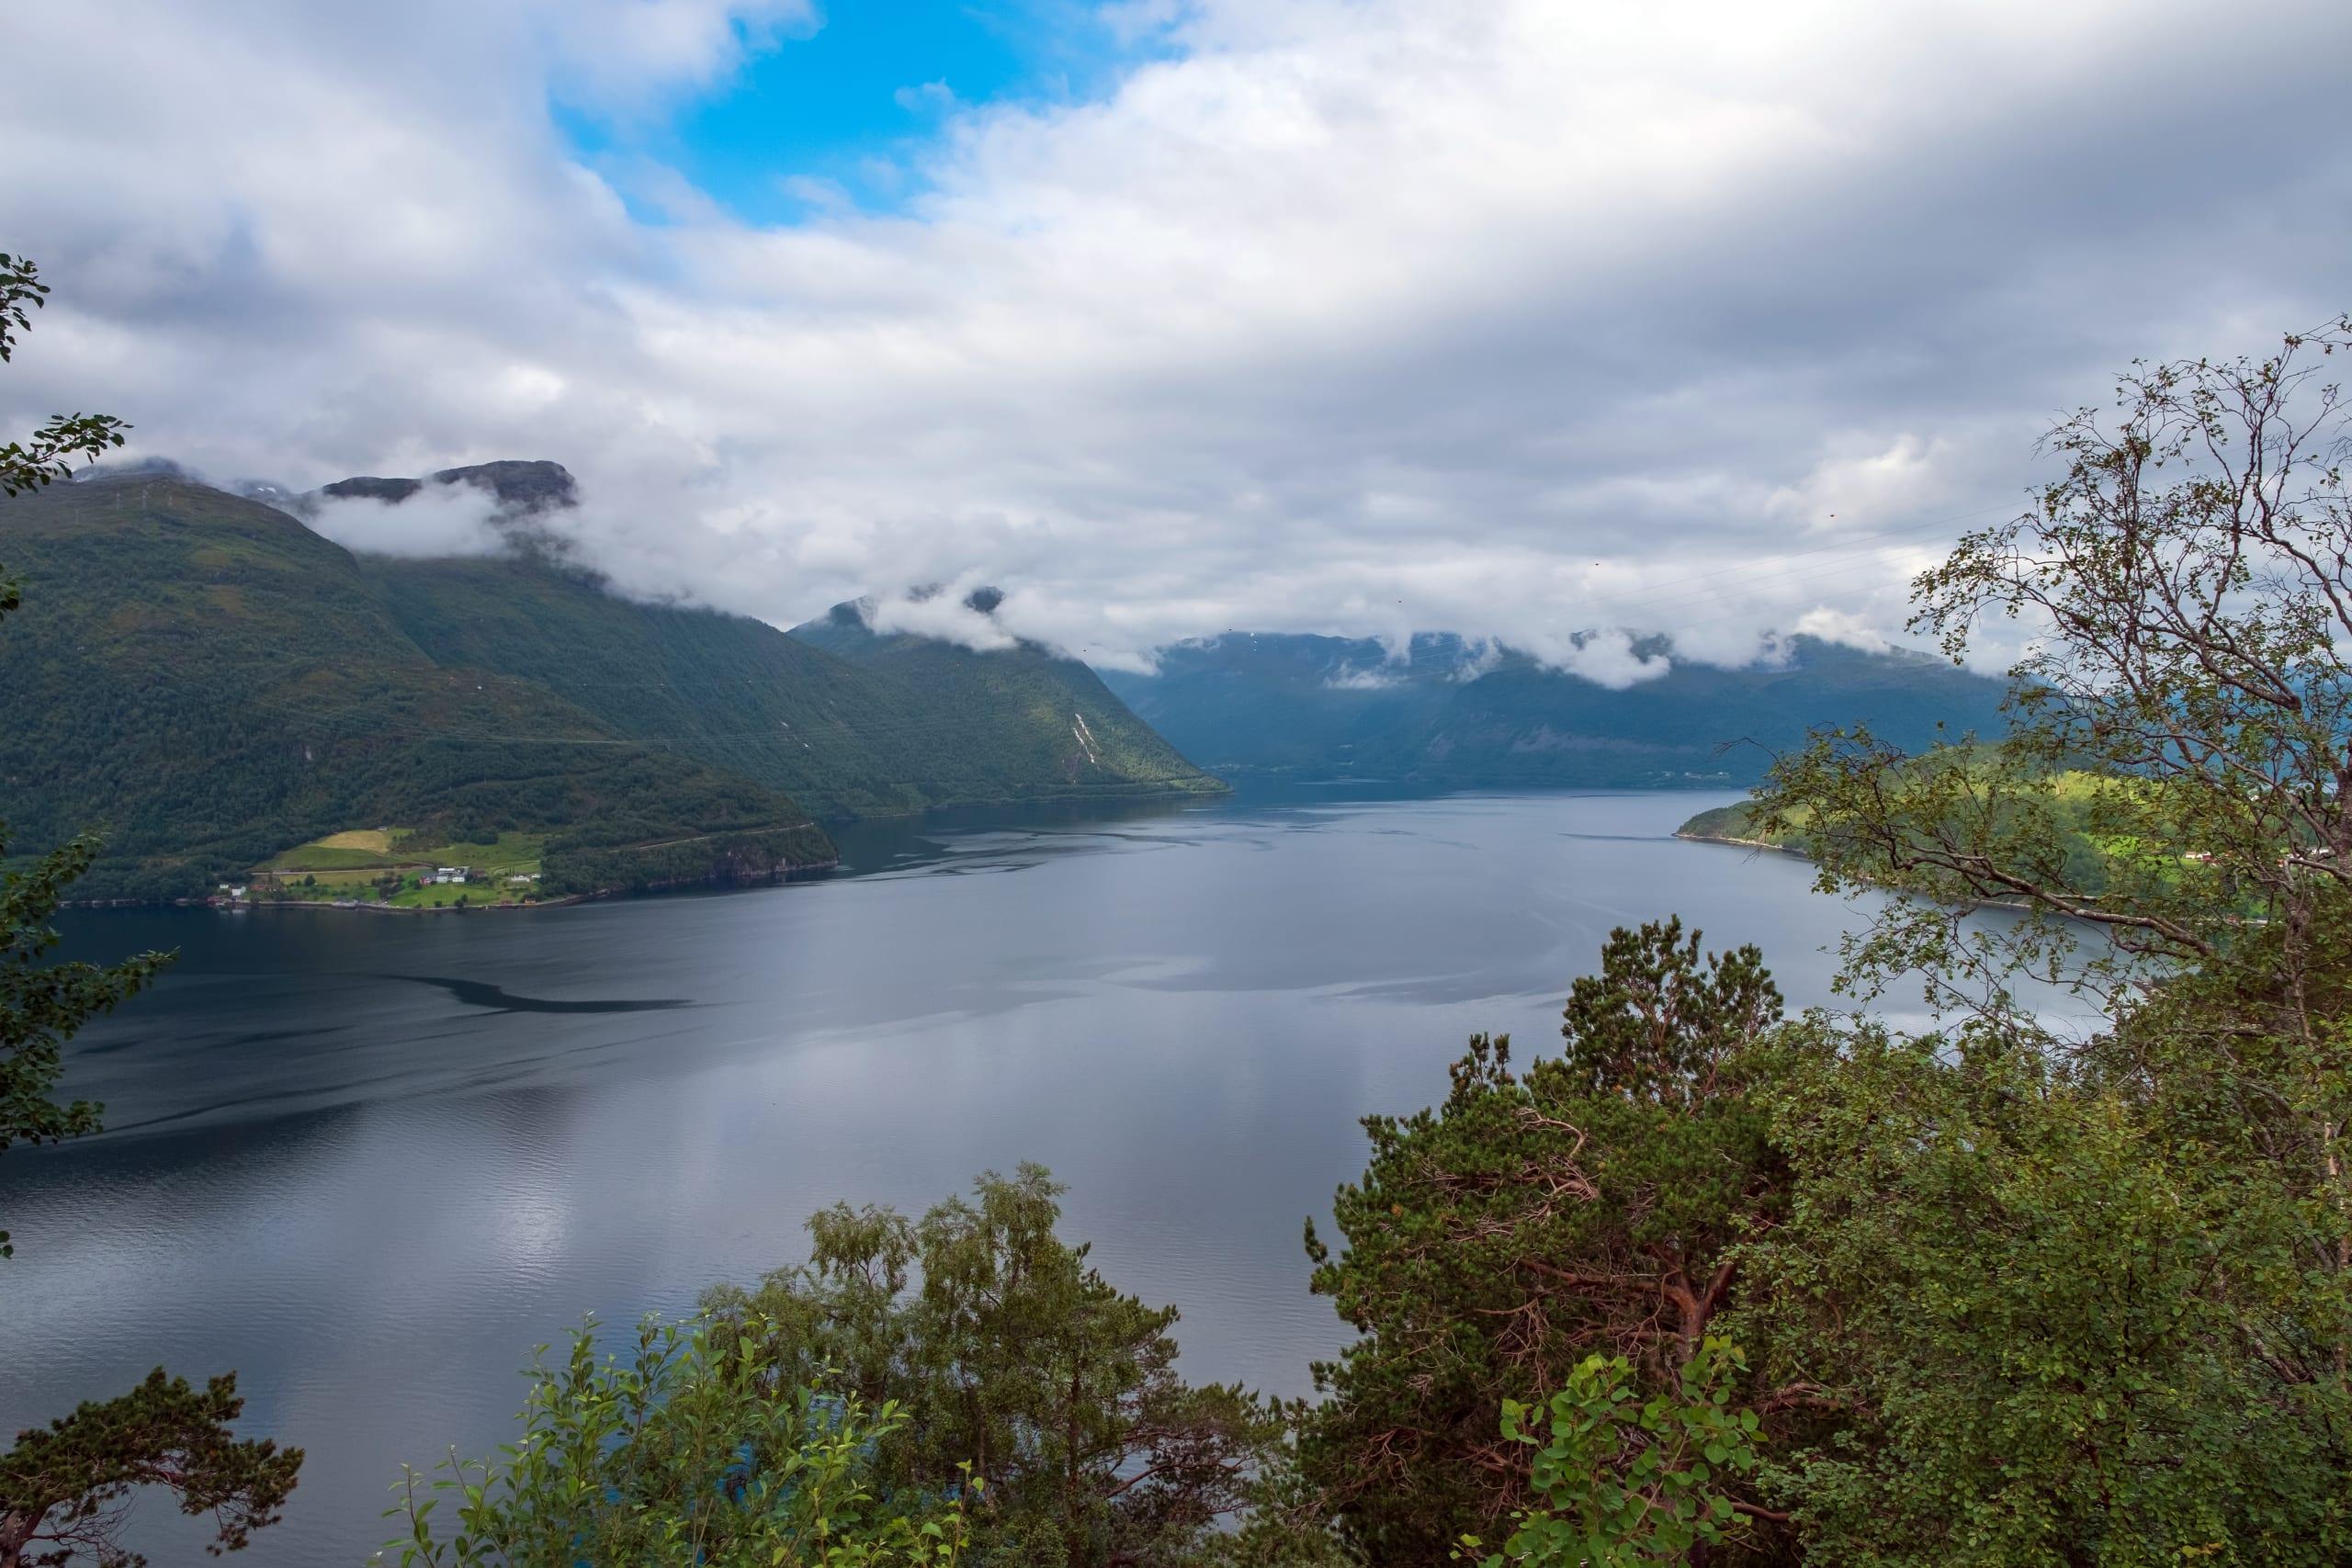 Hornindalsvatnet , Europe's deepest lake